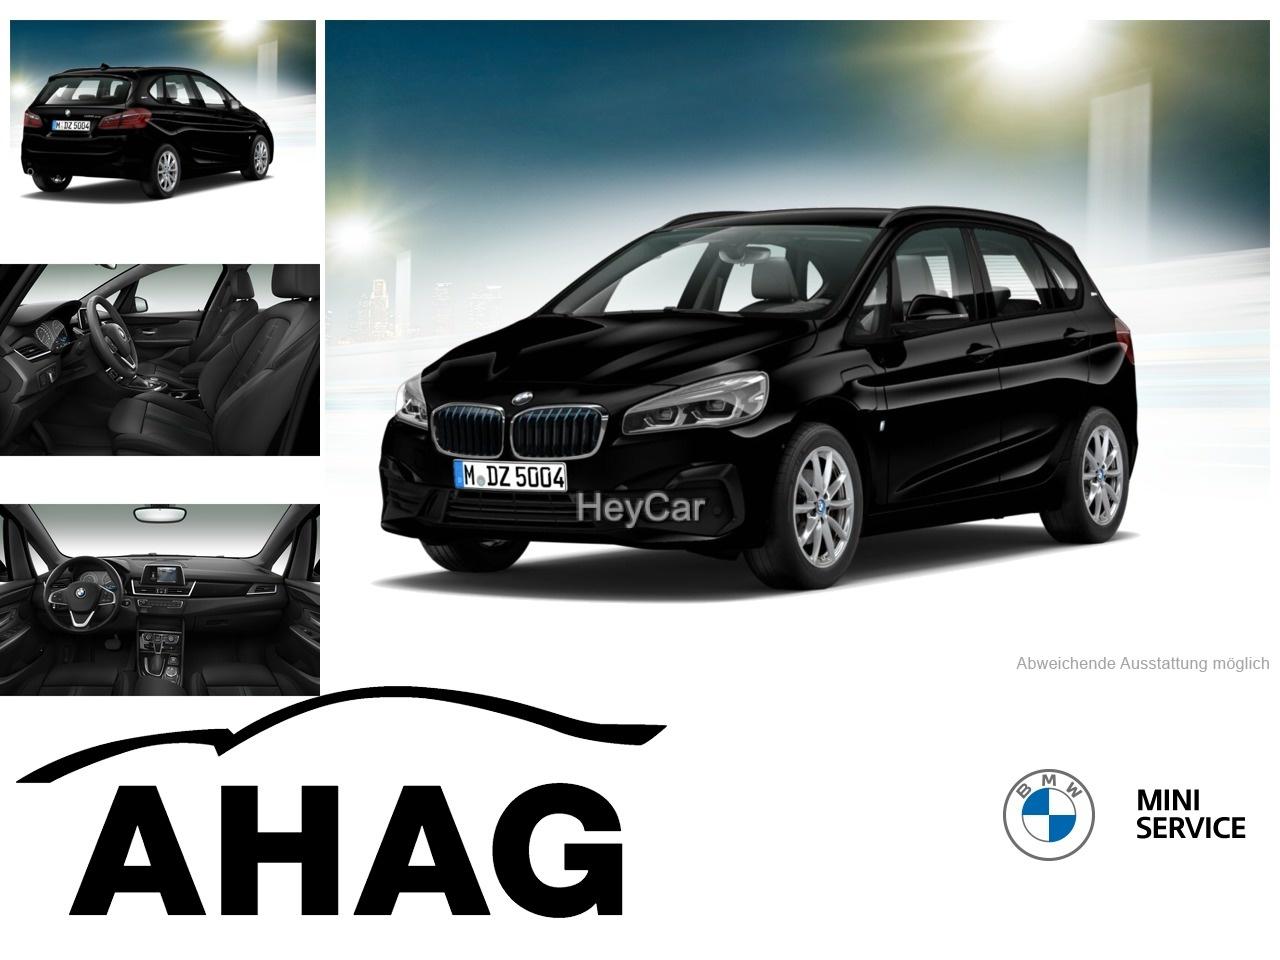 BMW 225 Active Tourer xe iPerformance Steptronic Advantage Navi Automatik HiFi Bluetooth PDC MP3 Schn., Jahr 2018, Hybrid